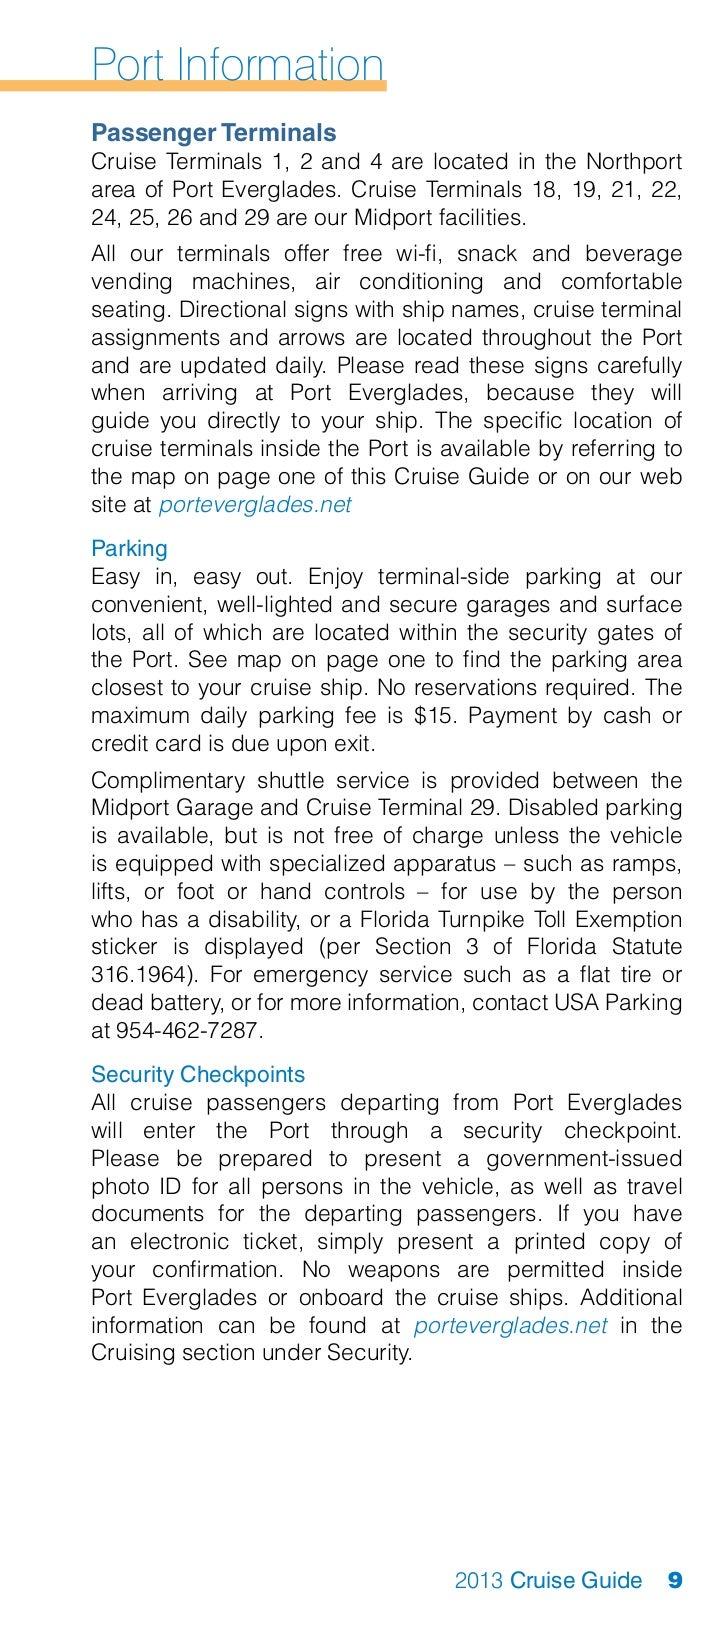 Port Everglades 2013 Cruise Guide